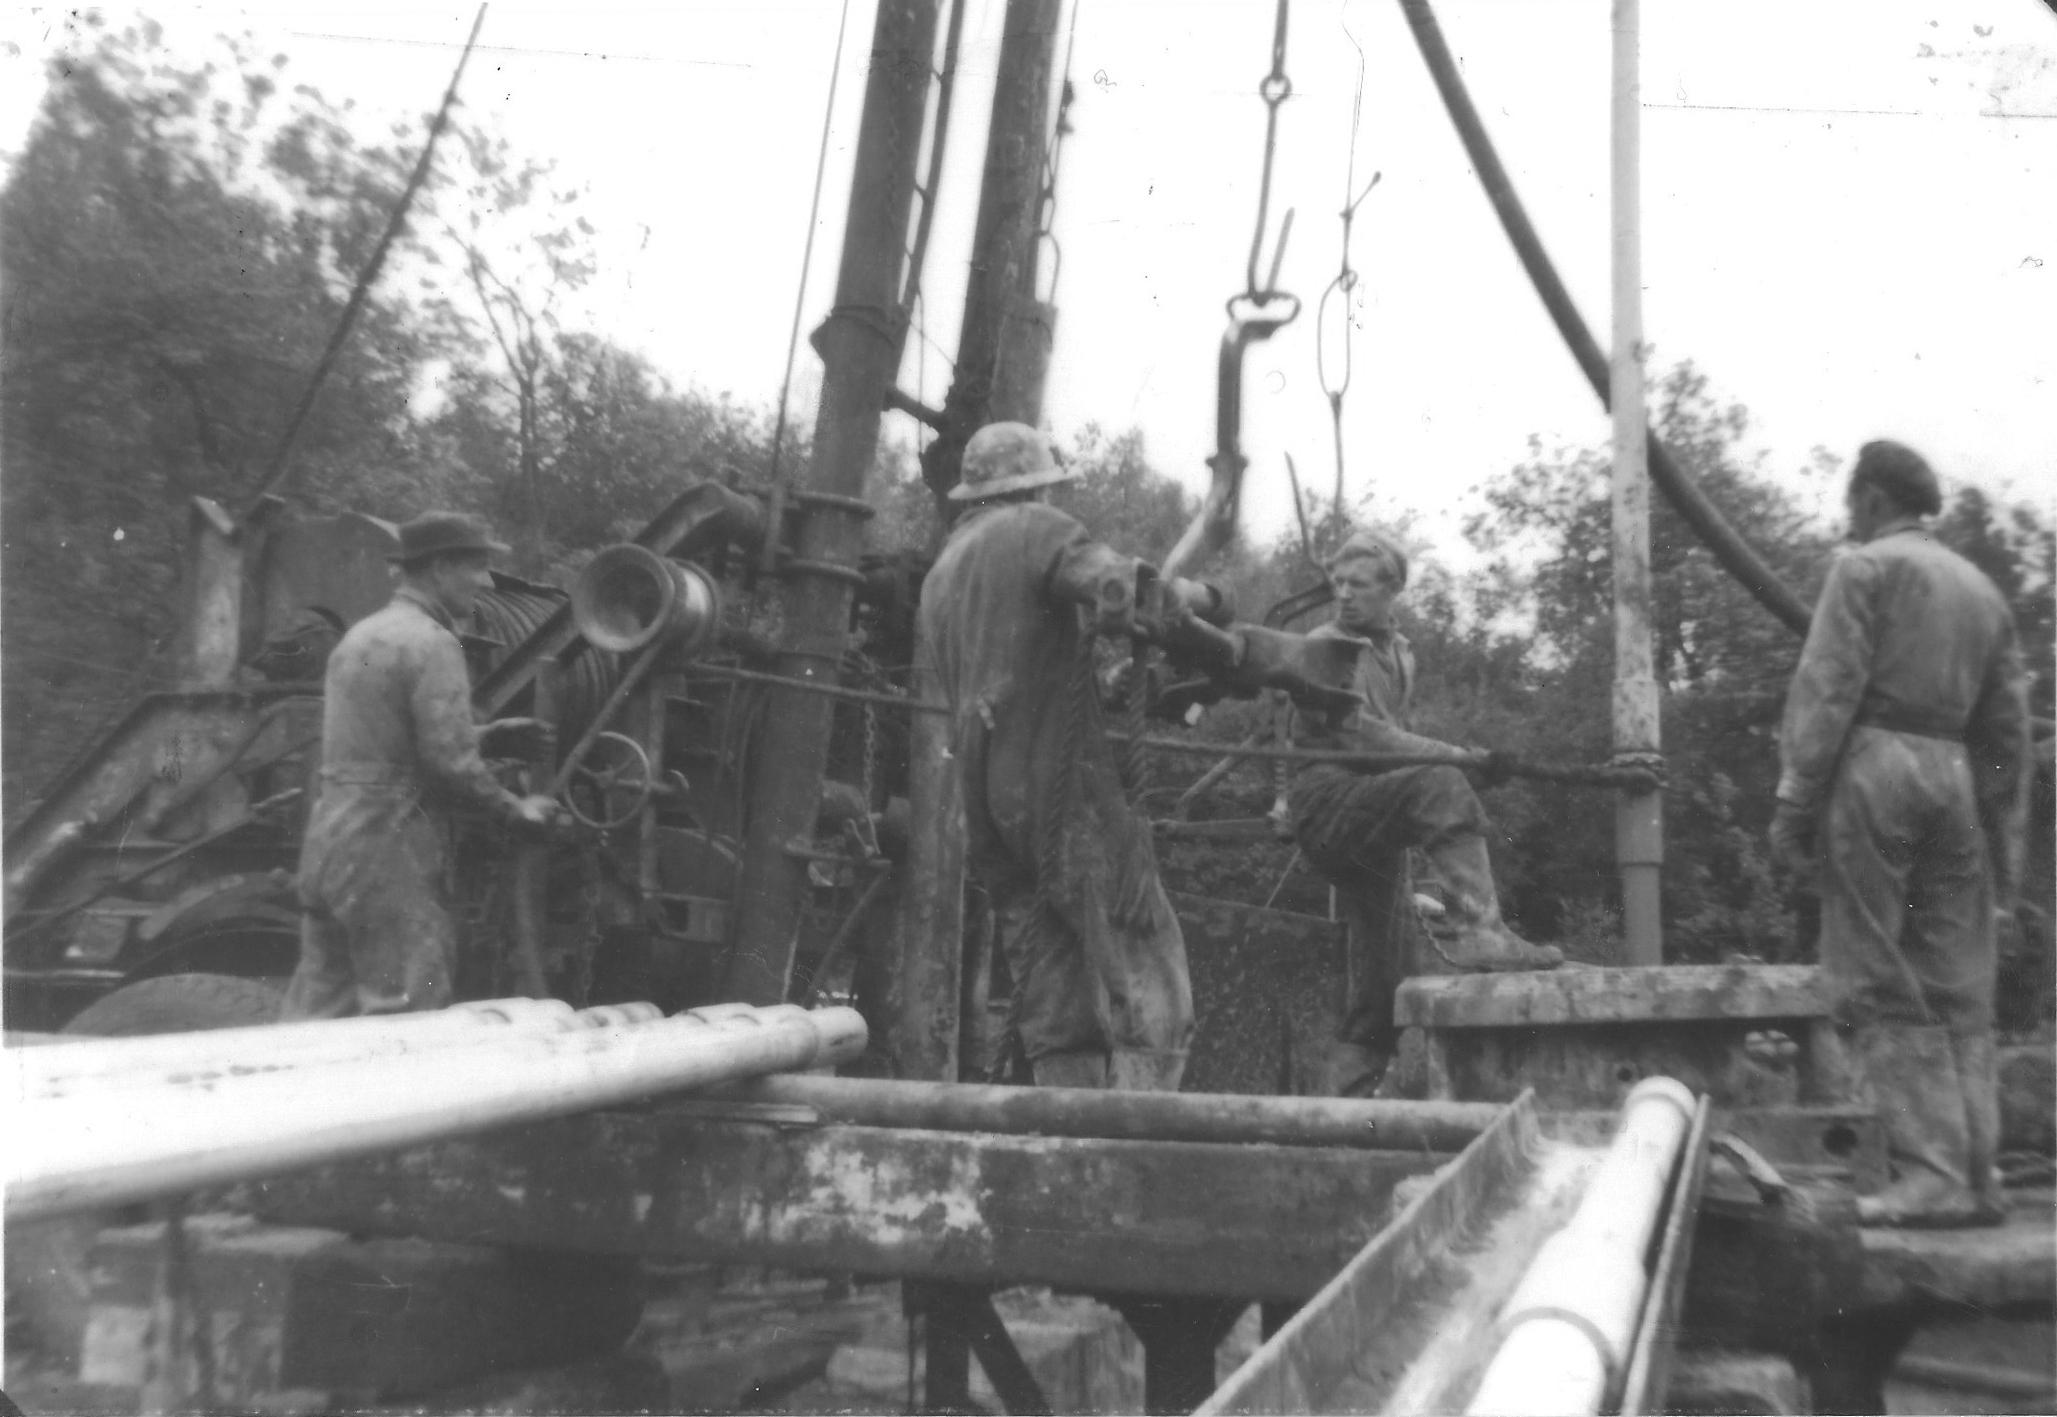 Duke's Wood Oil Workers